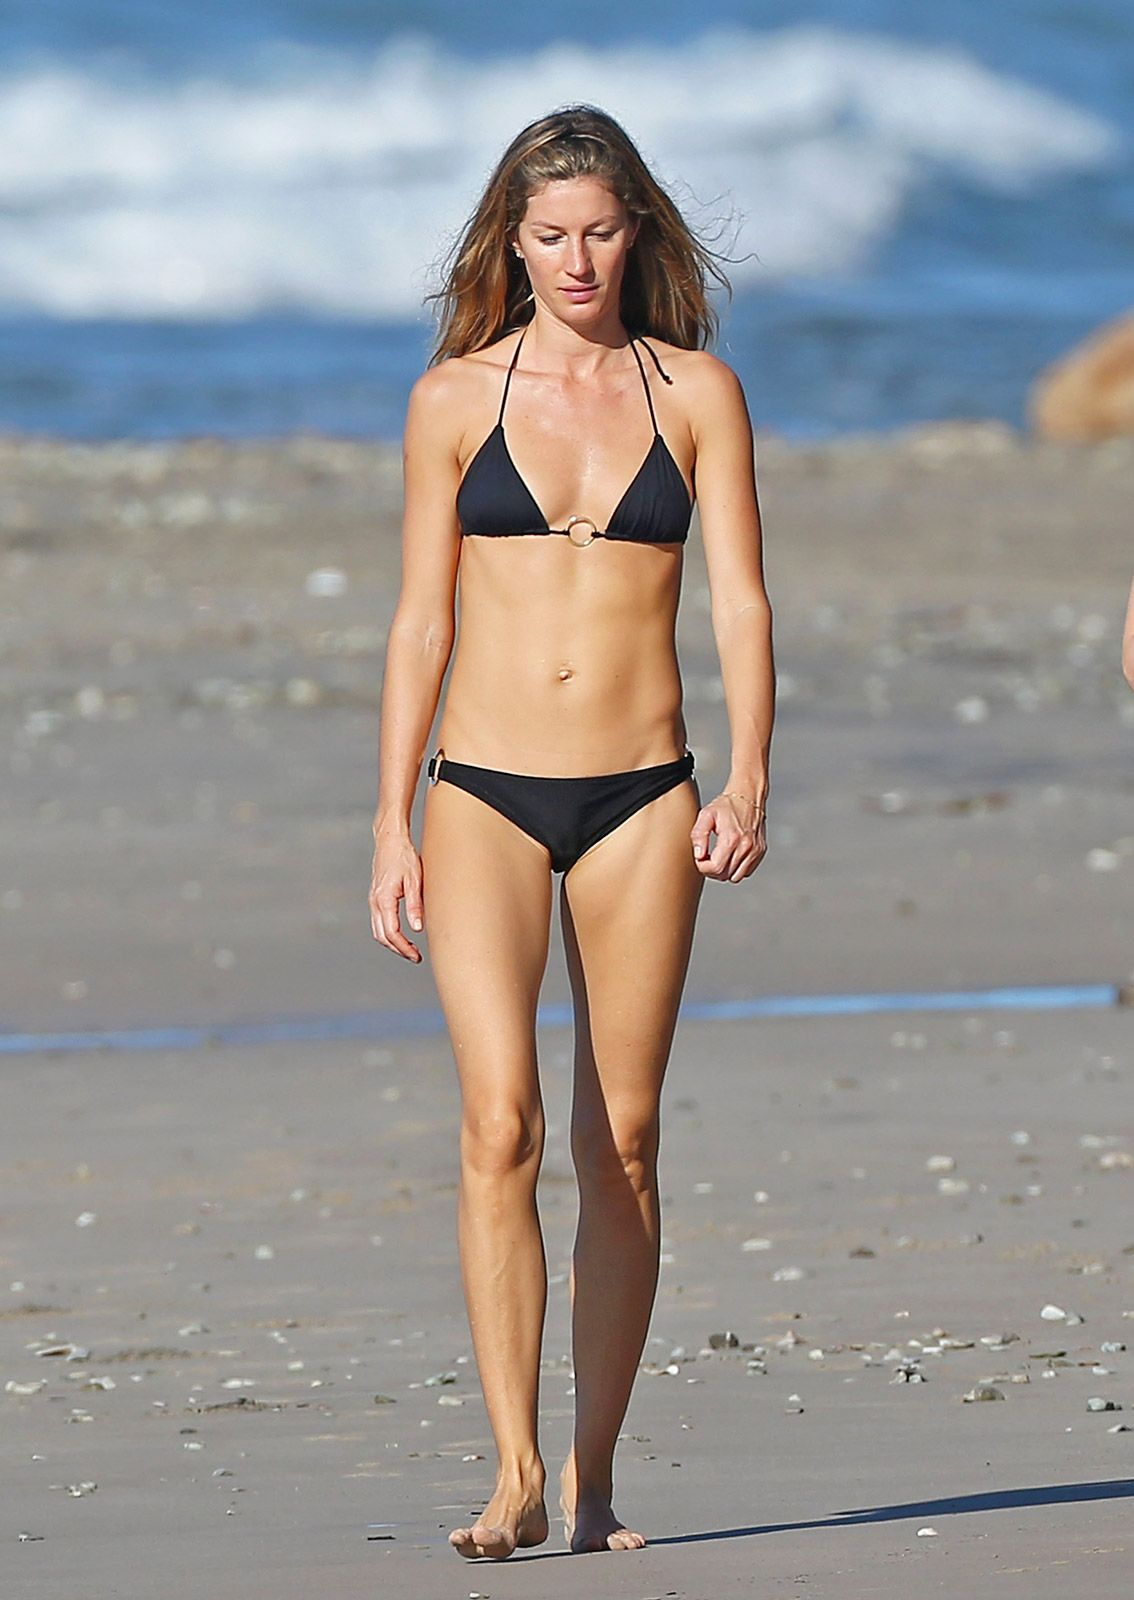 458c90a090d95 Gisele Bundchen showed she s still every inch a supermodel as she showed  off her amazingly skinny